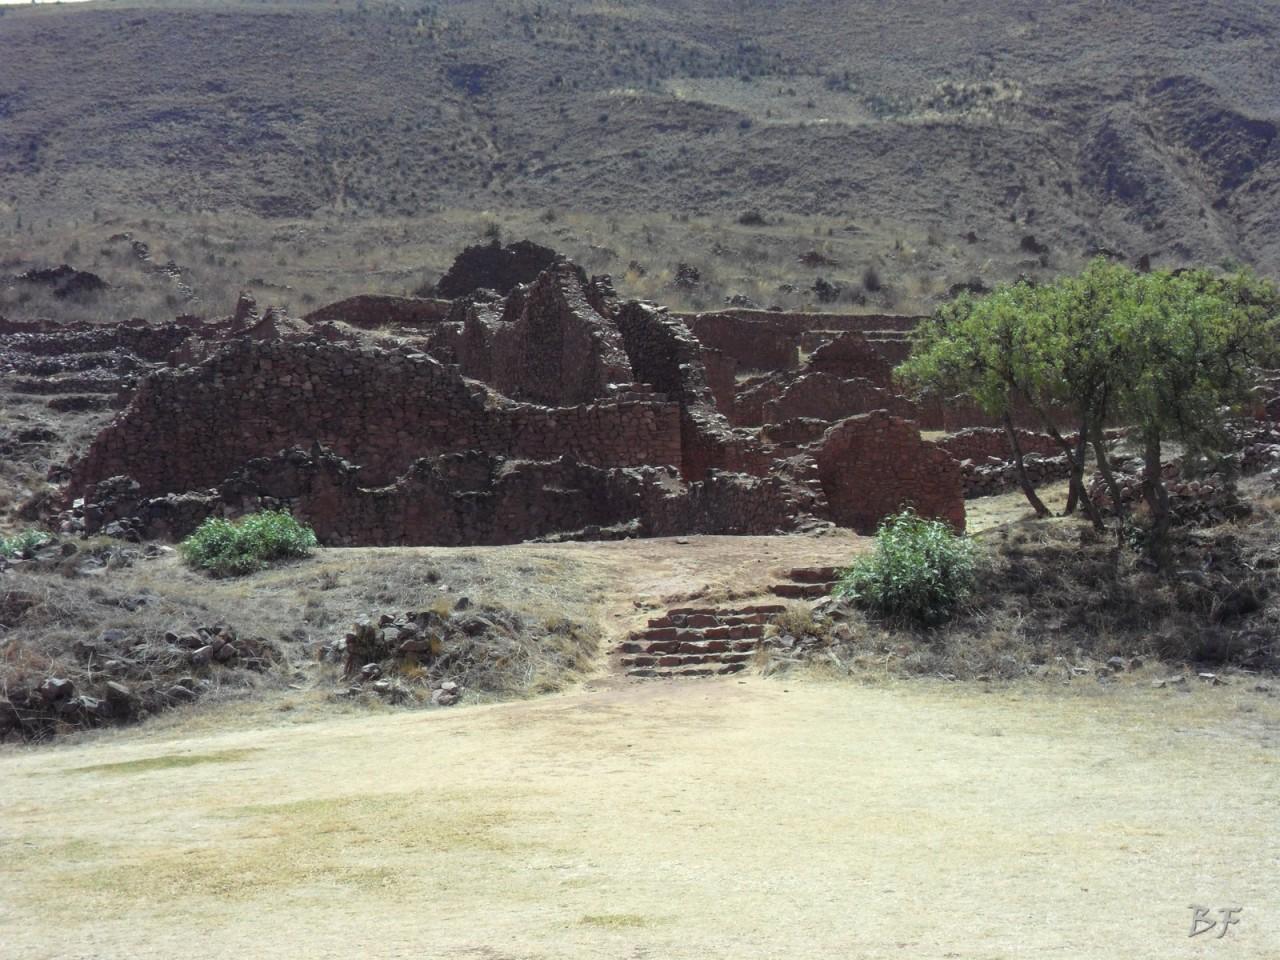 Parco-Archeologico-Megaliti-Pikillacta-Andahuaylillas-Cusco-Perù-1